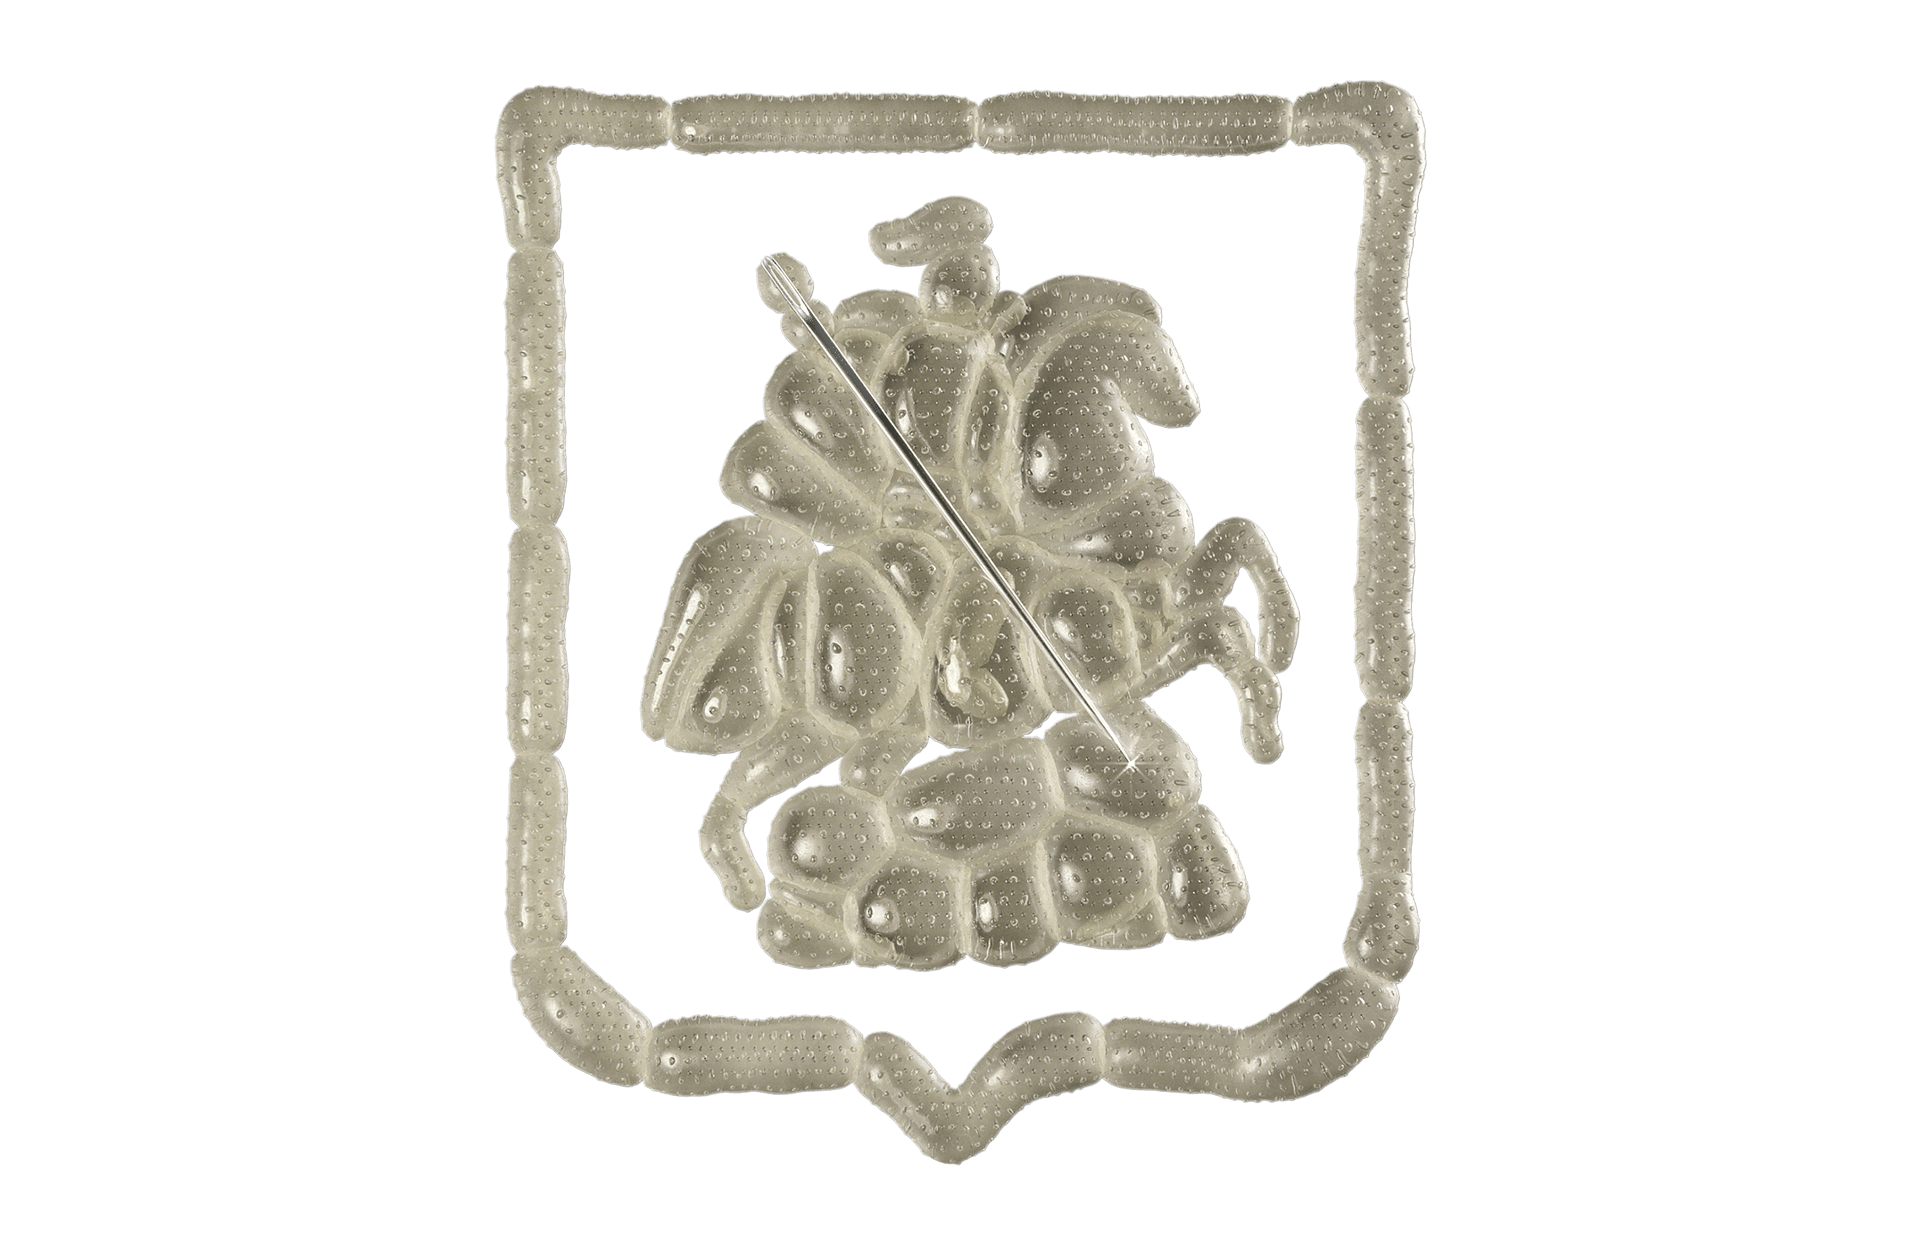 03 - Новый герб Москвы